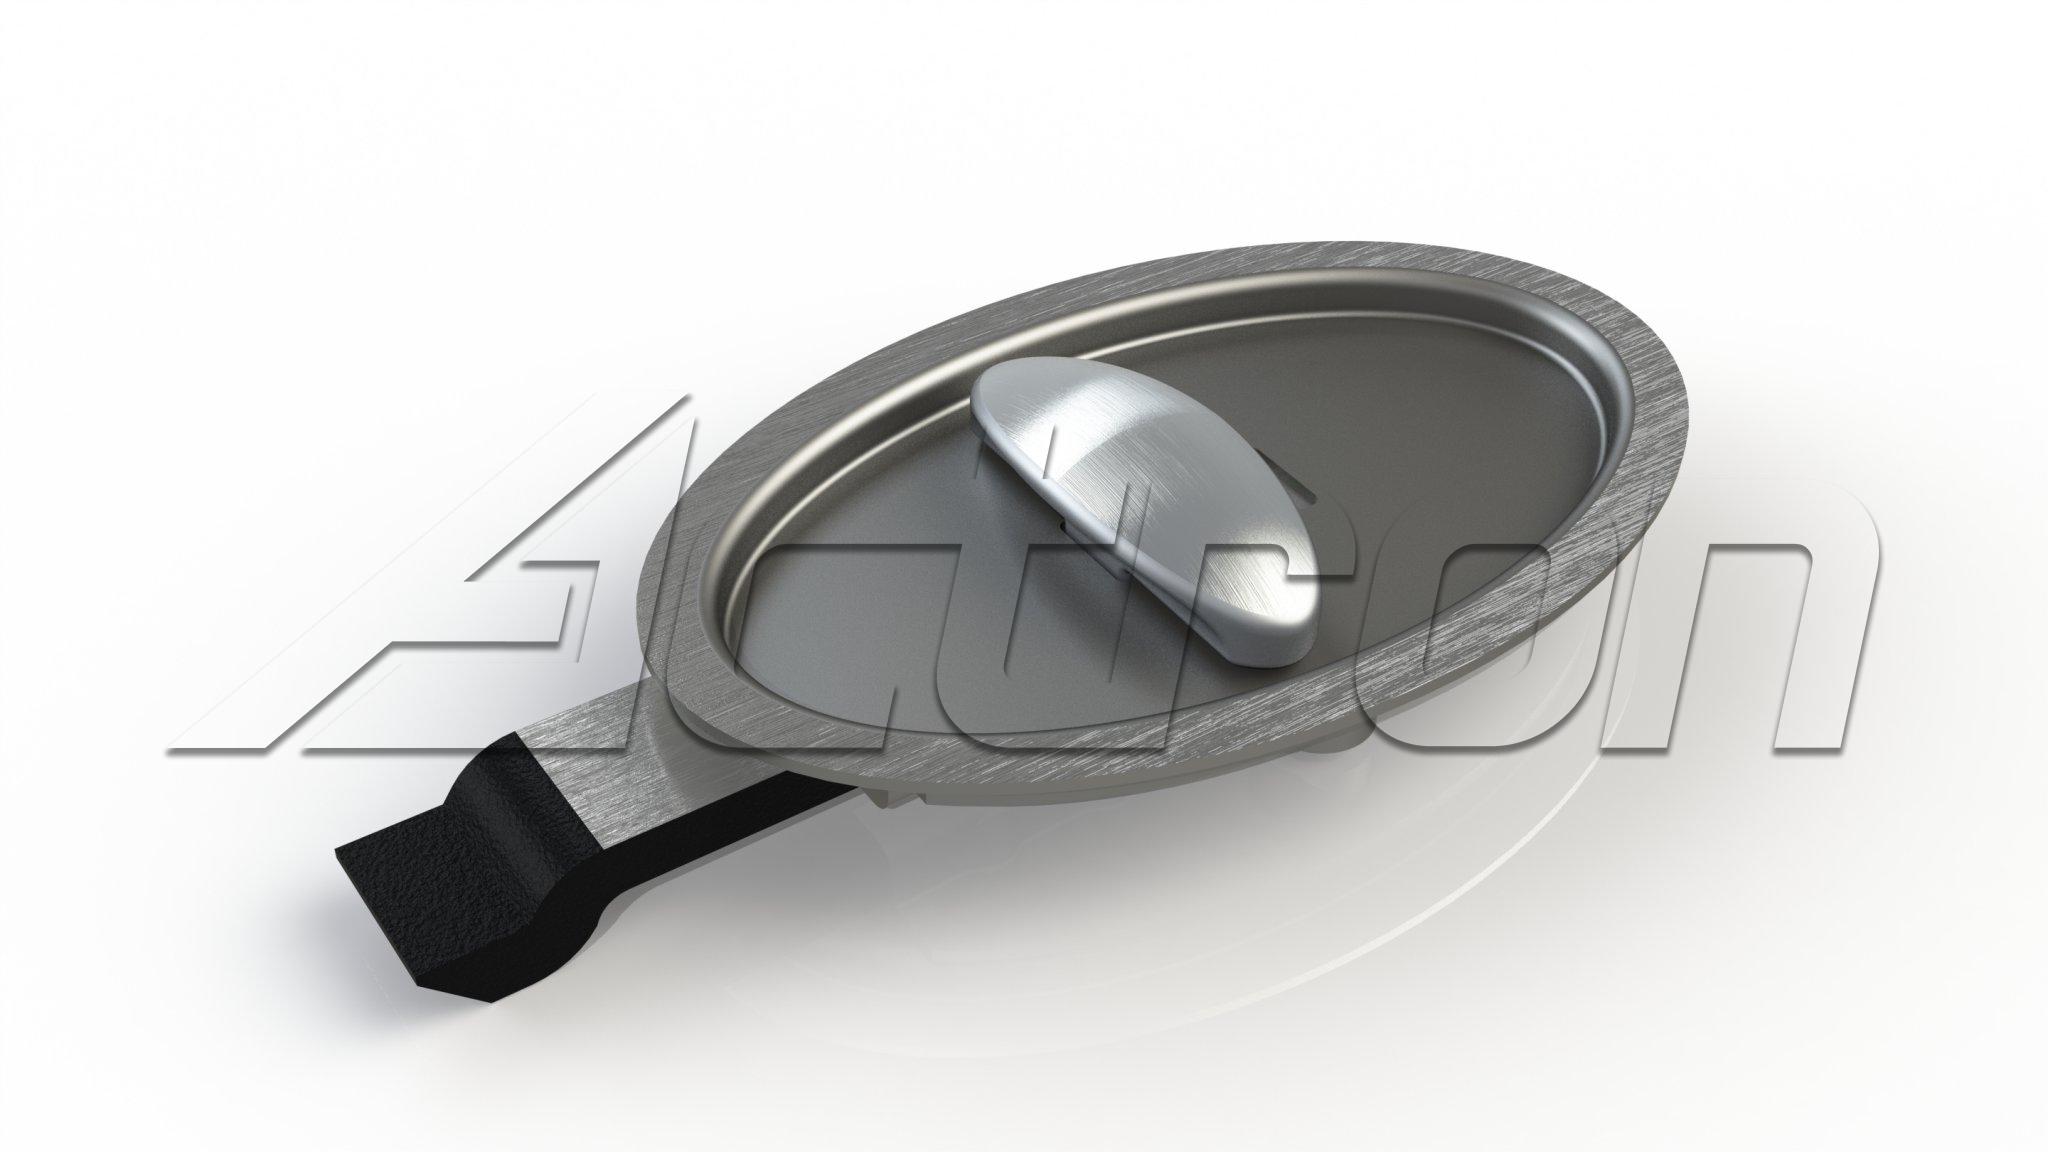 latch-assy-8211-sliding-5518-a27311.jpg